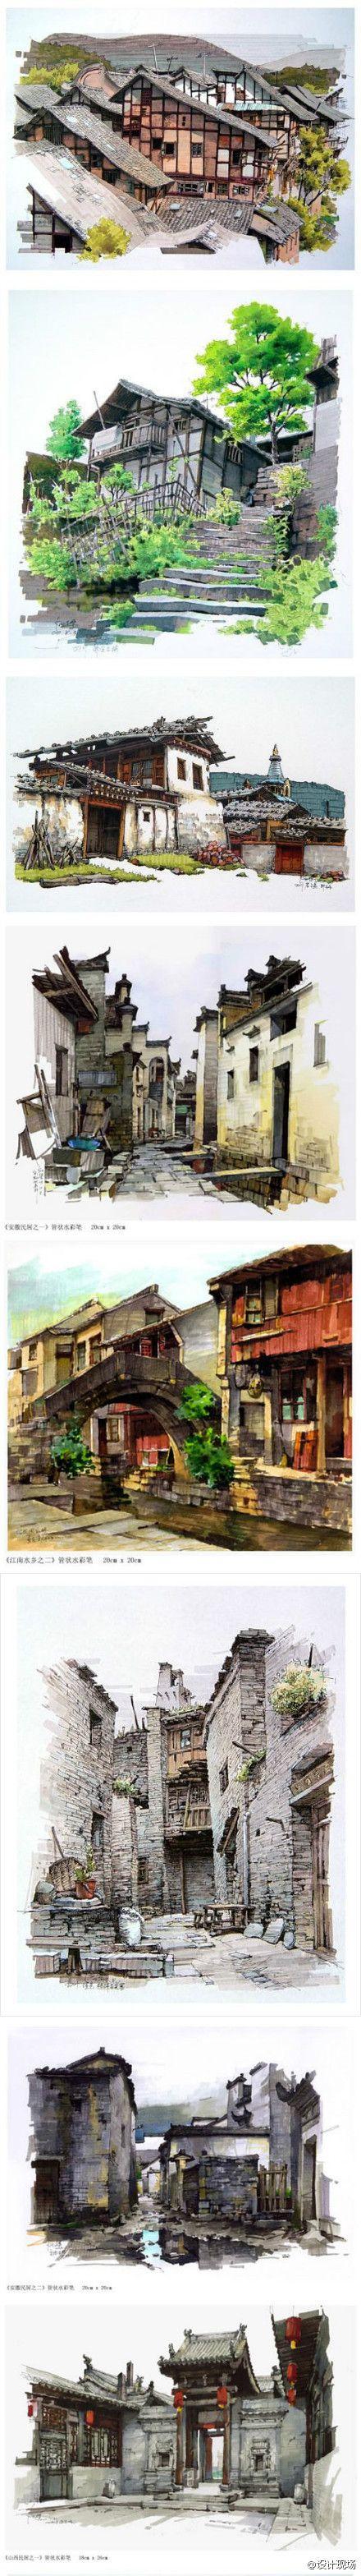 Create Art Portfolio Ideas  187617839561906bc3200a7ee1baf49e